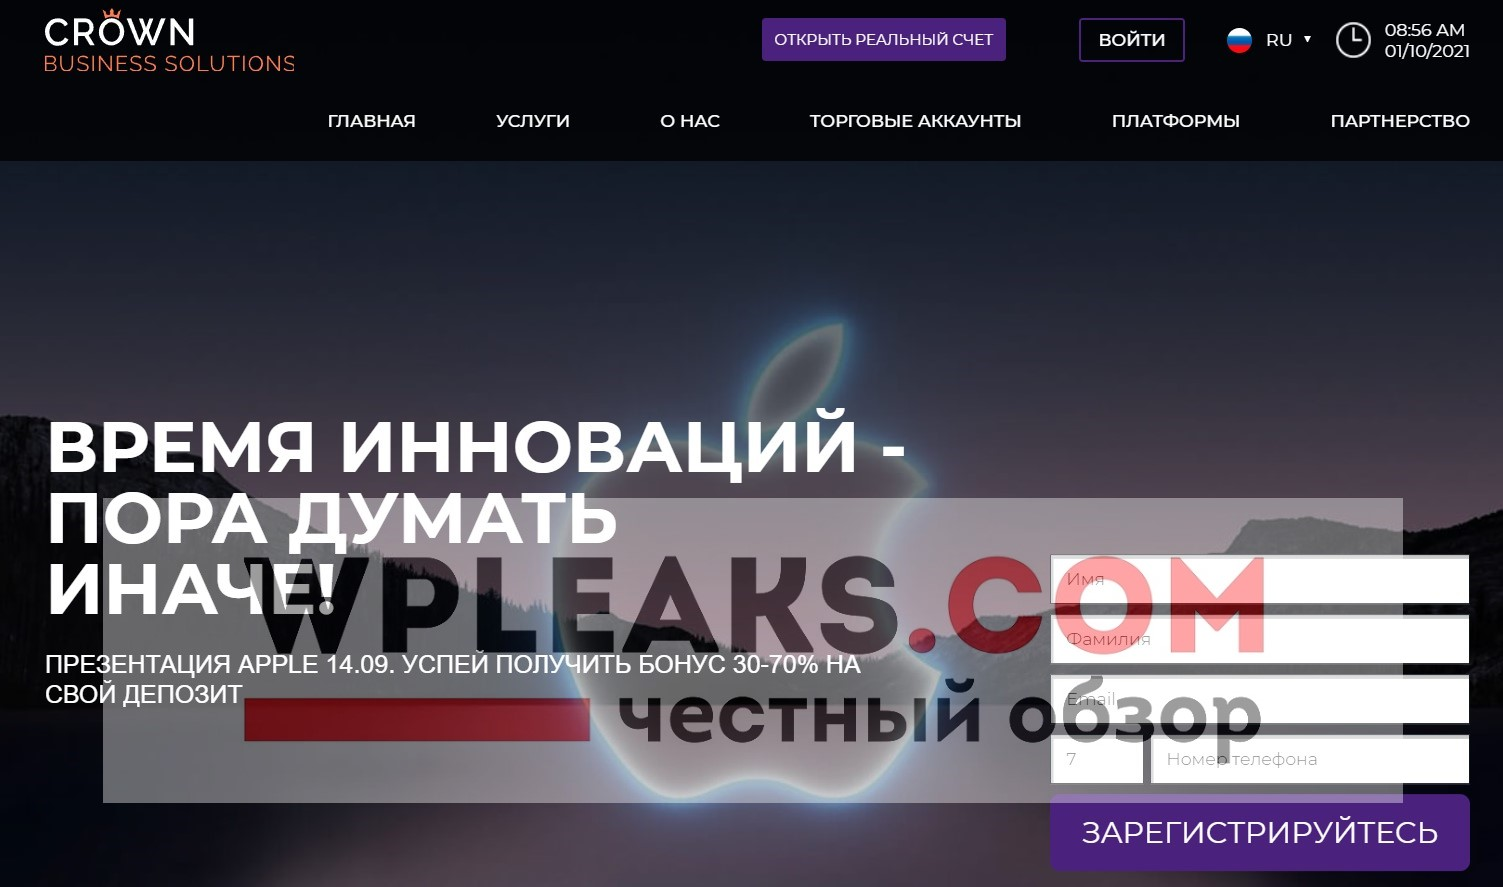 crown-business-solutions.com отзывы